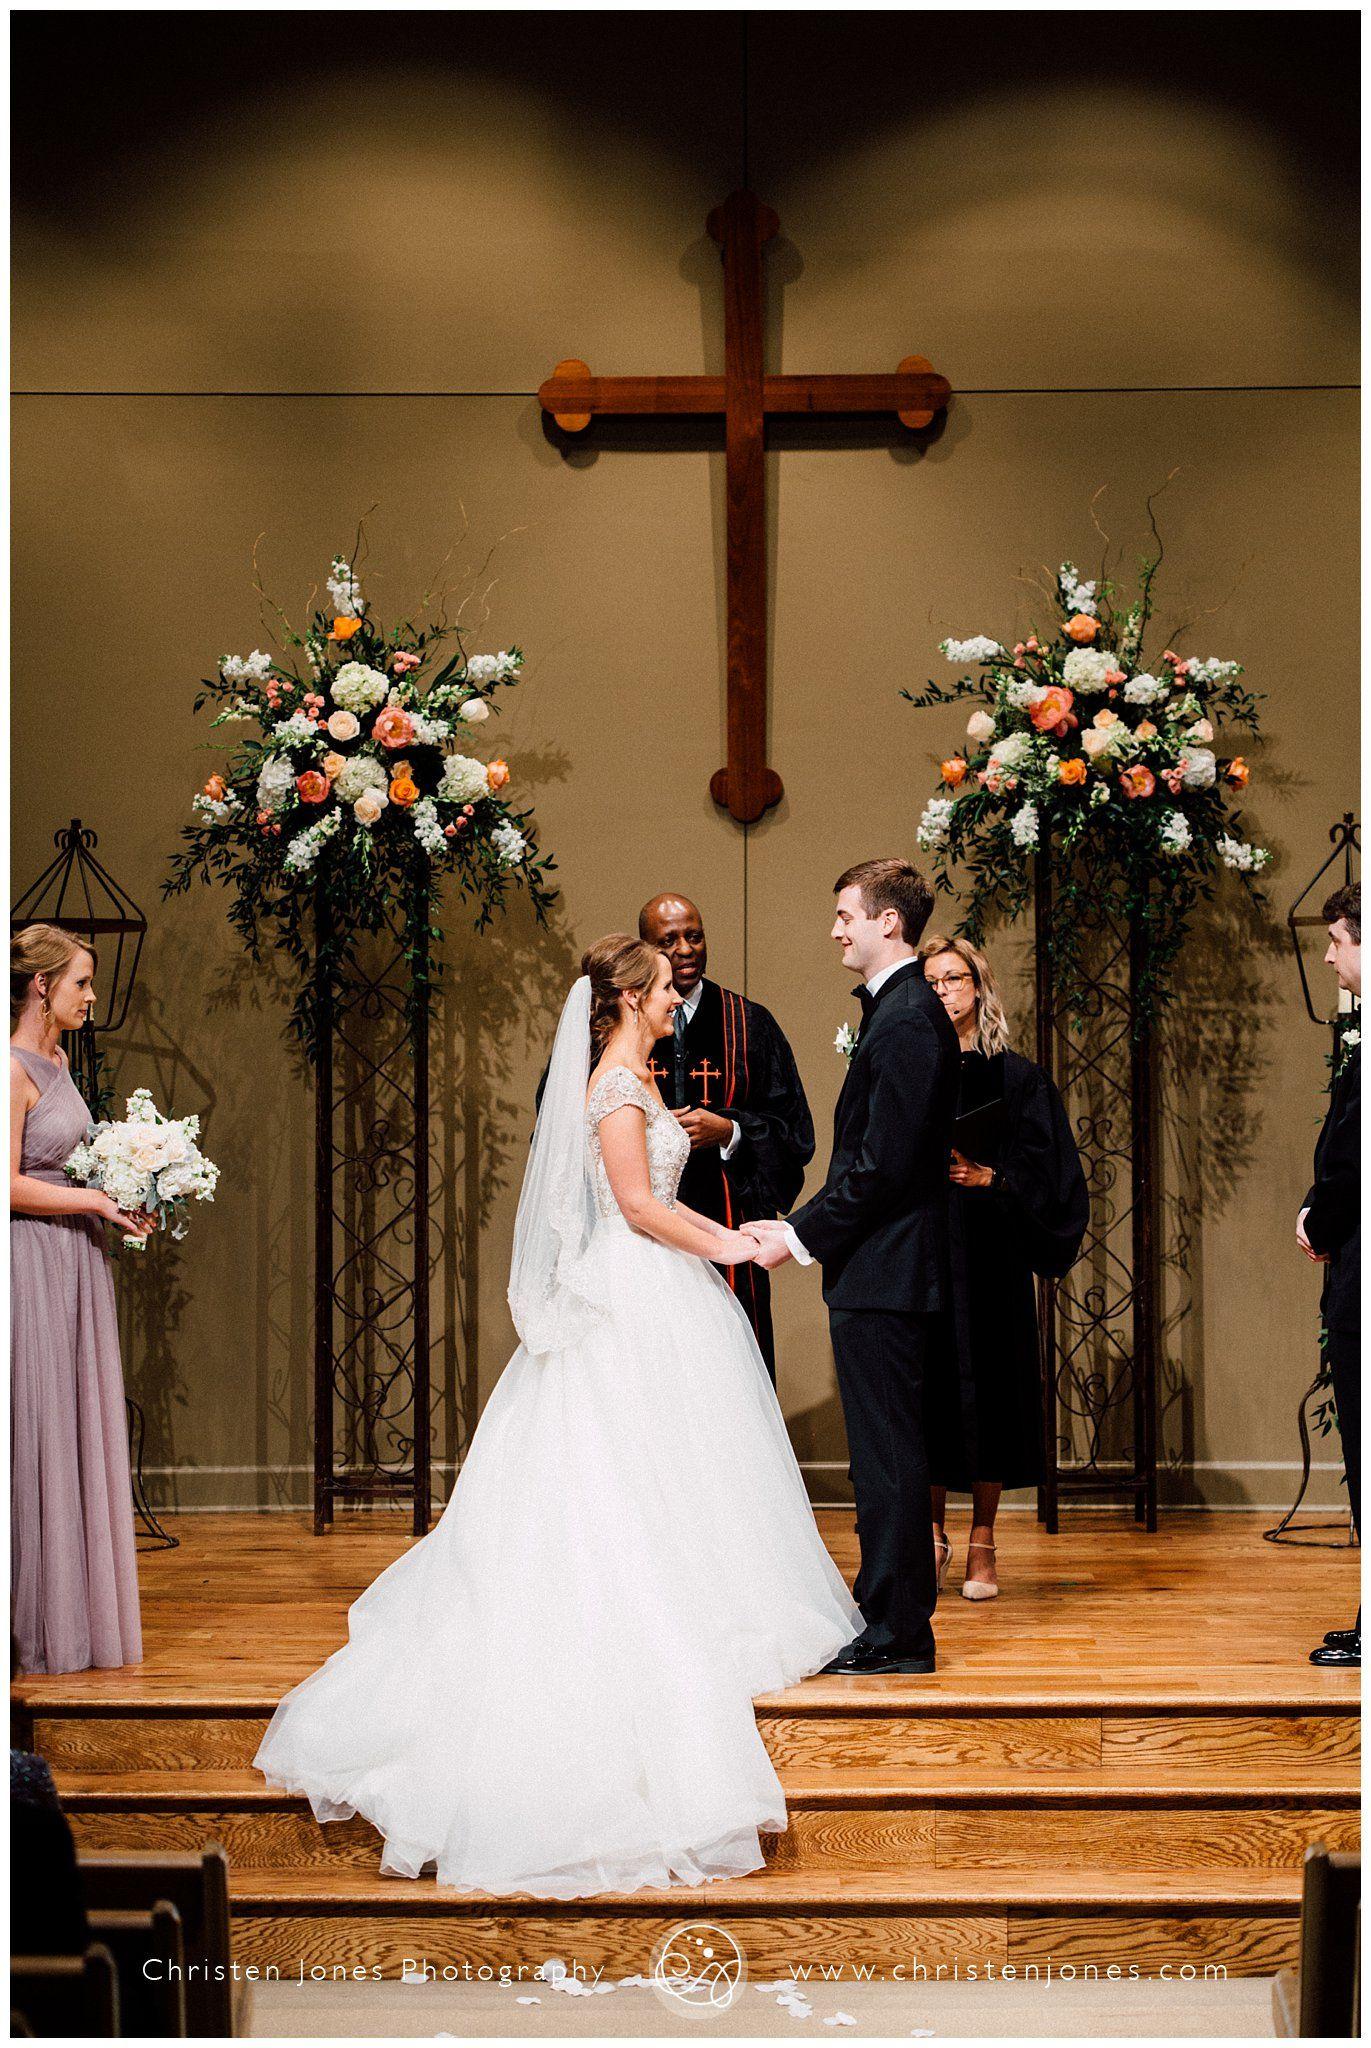 Hope Church Chapel Wedding Ceremony Memphis Flowers L And Jay Productions Vendors Christen Jones Photography